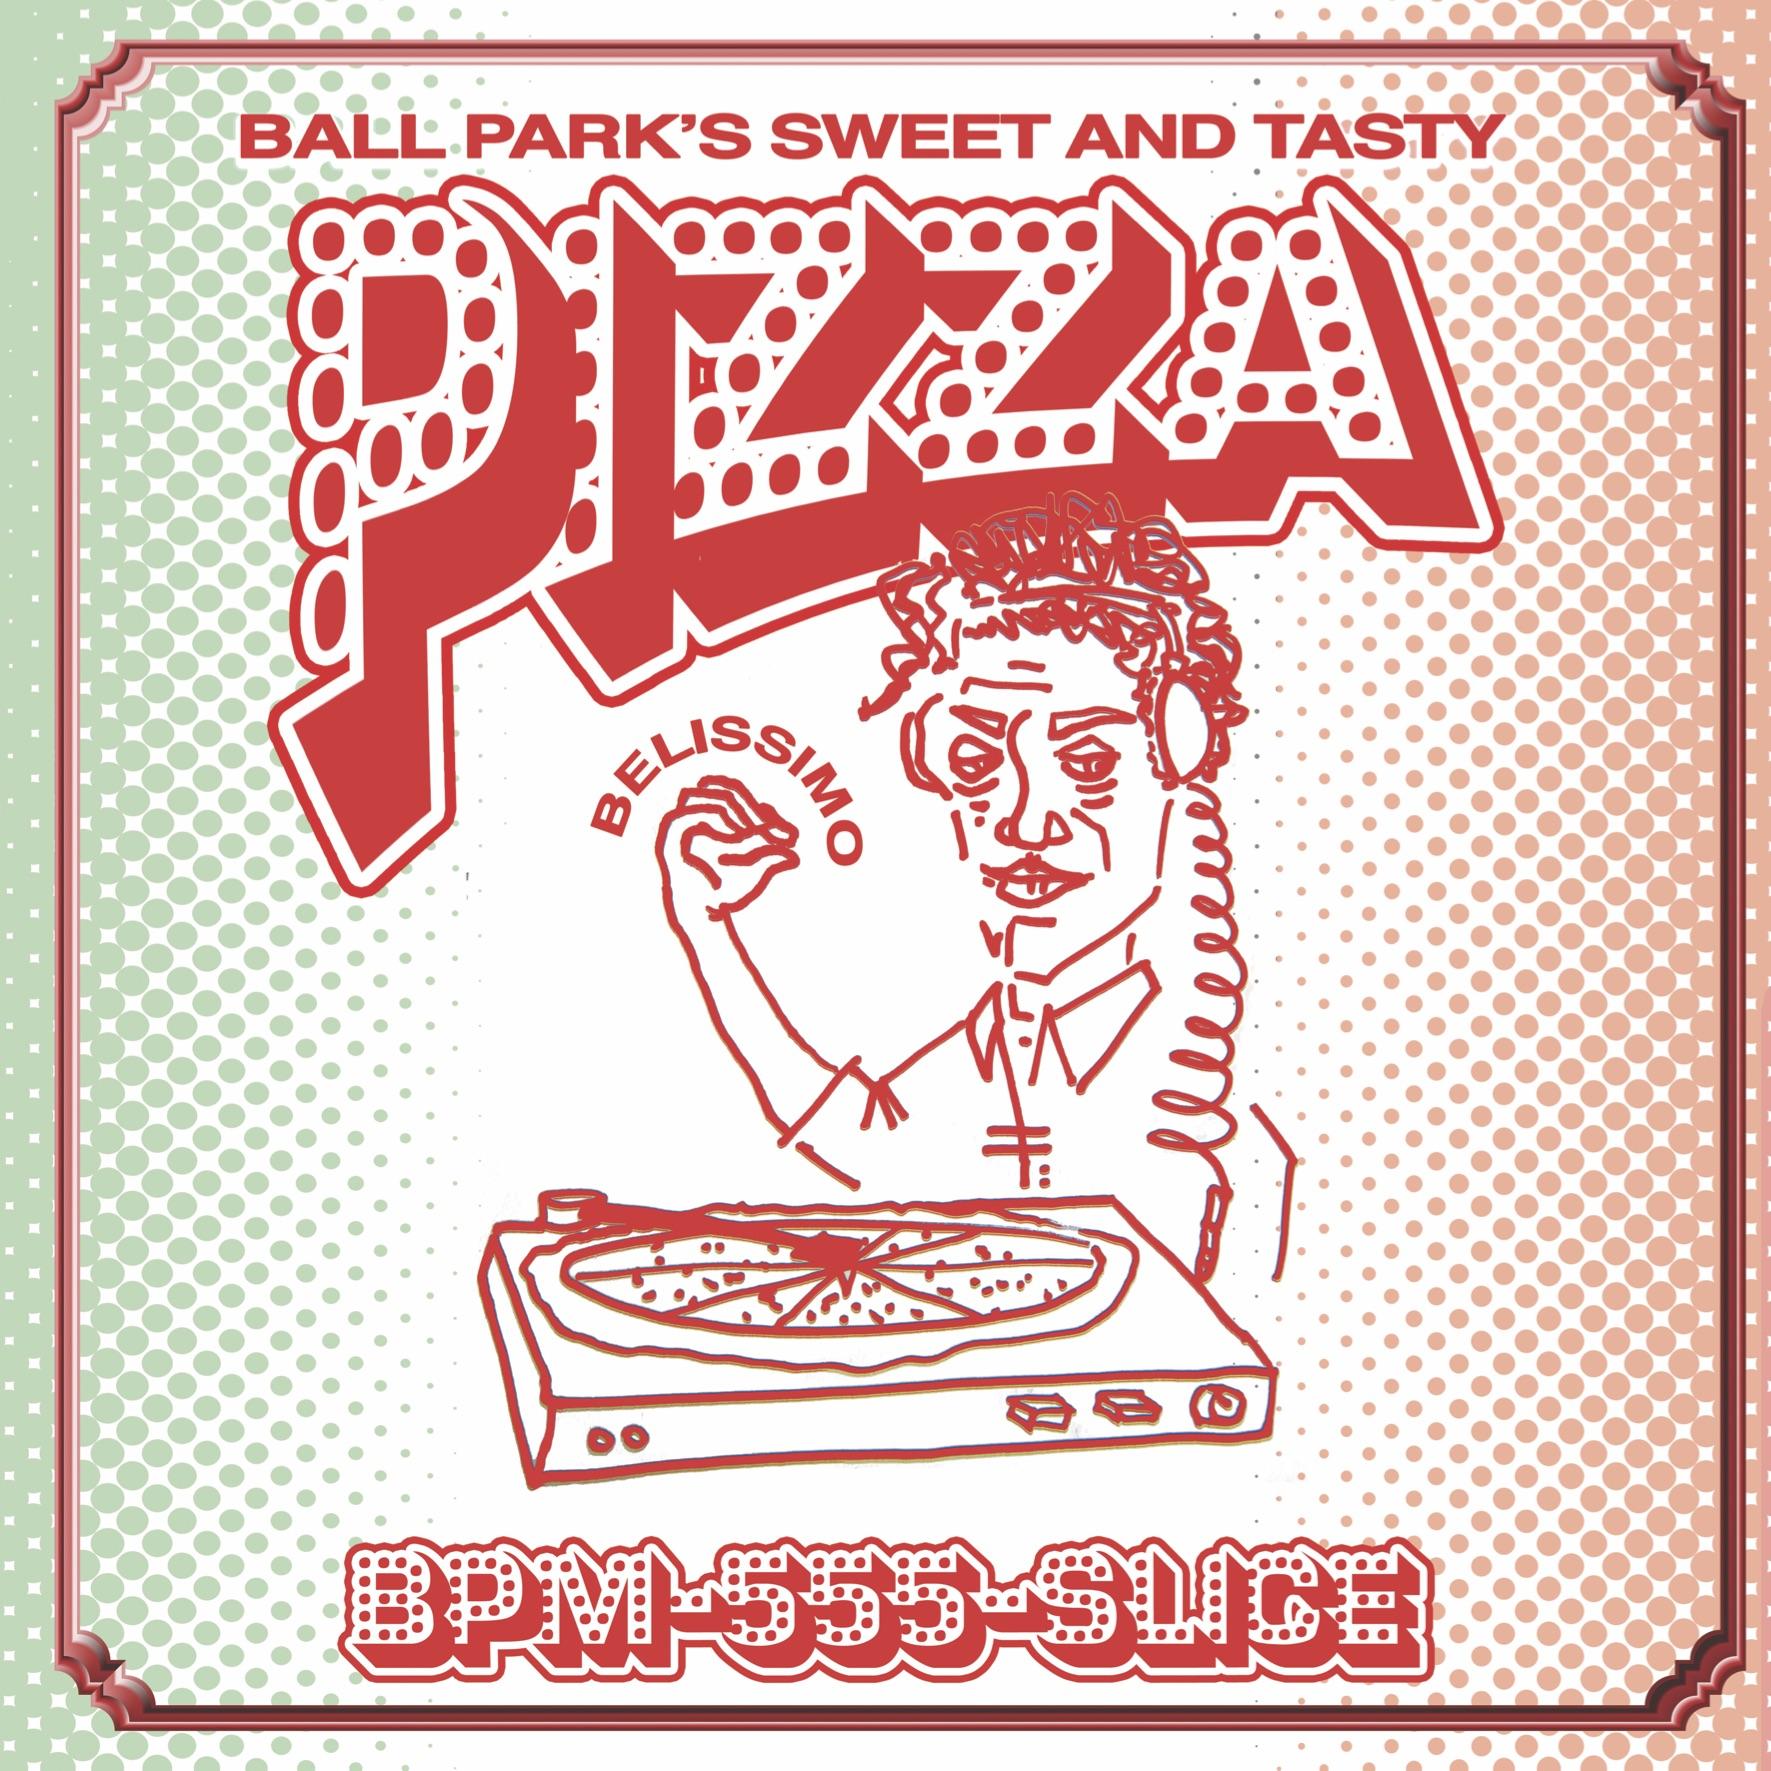 BPM Pizza Box - Ball Park Music